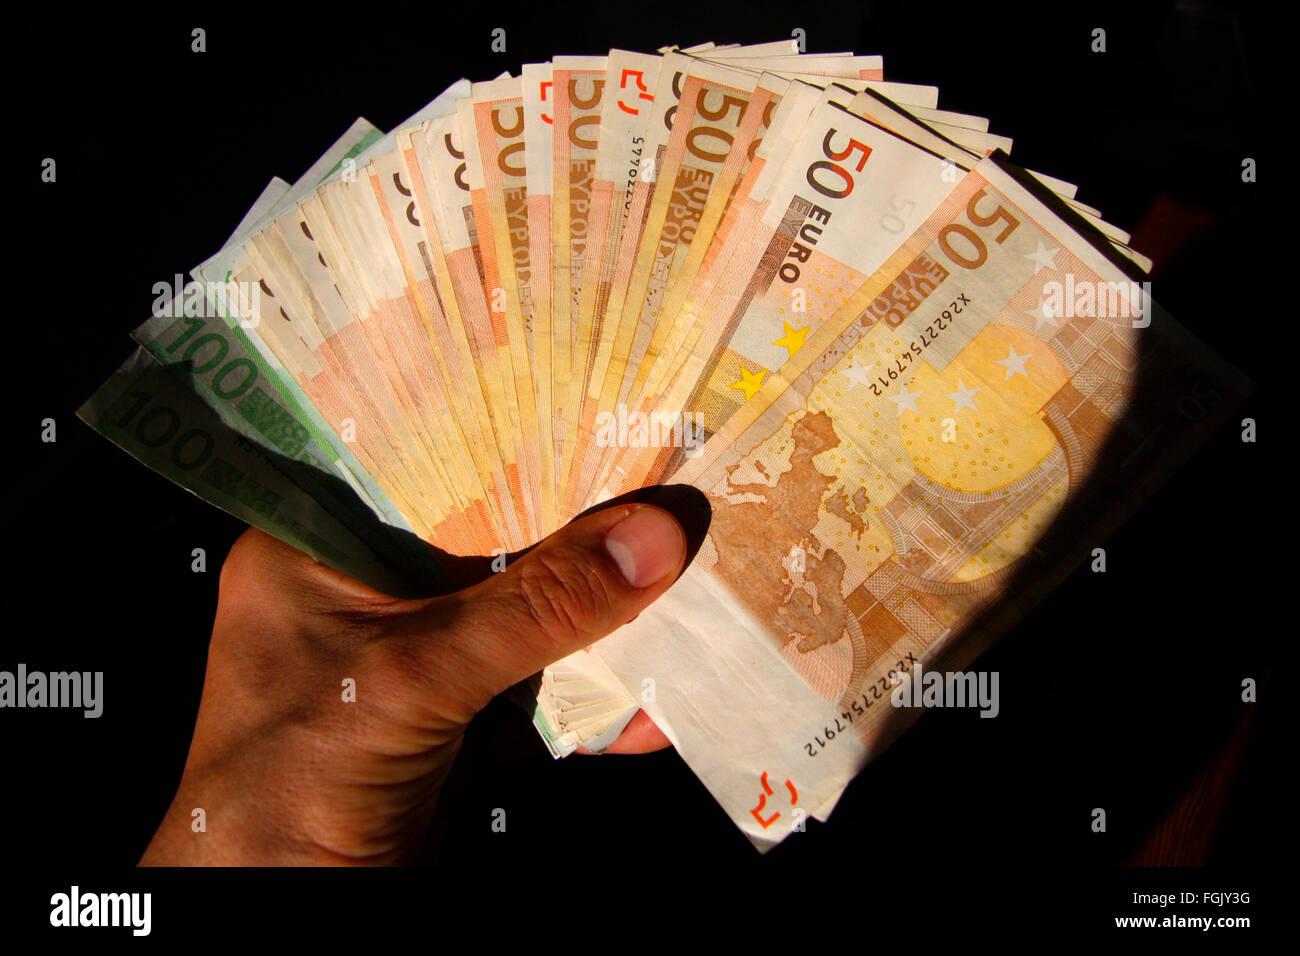 Symbolbild: geld: Euros. - Stock Image